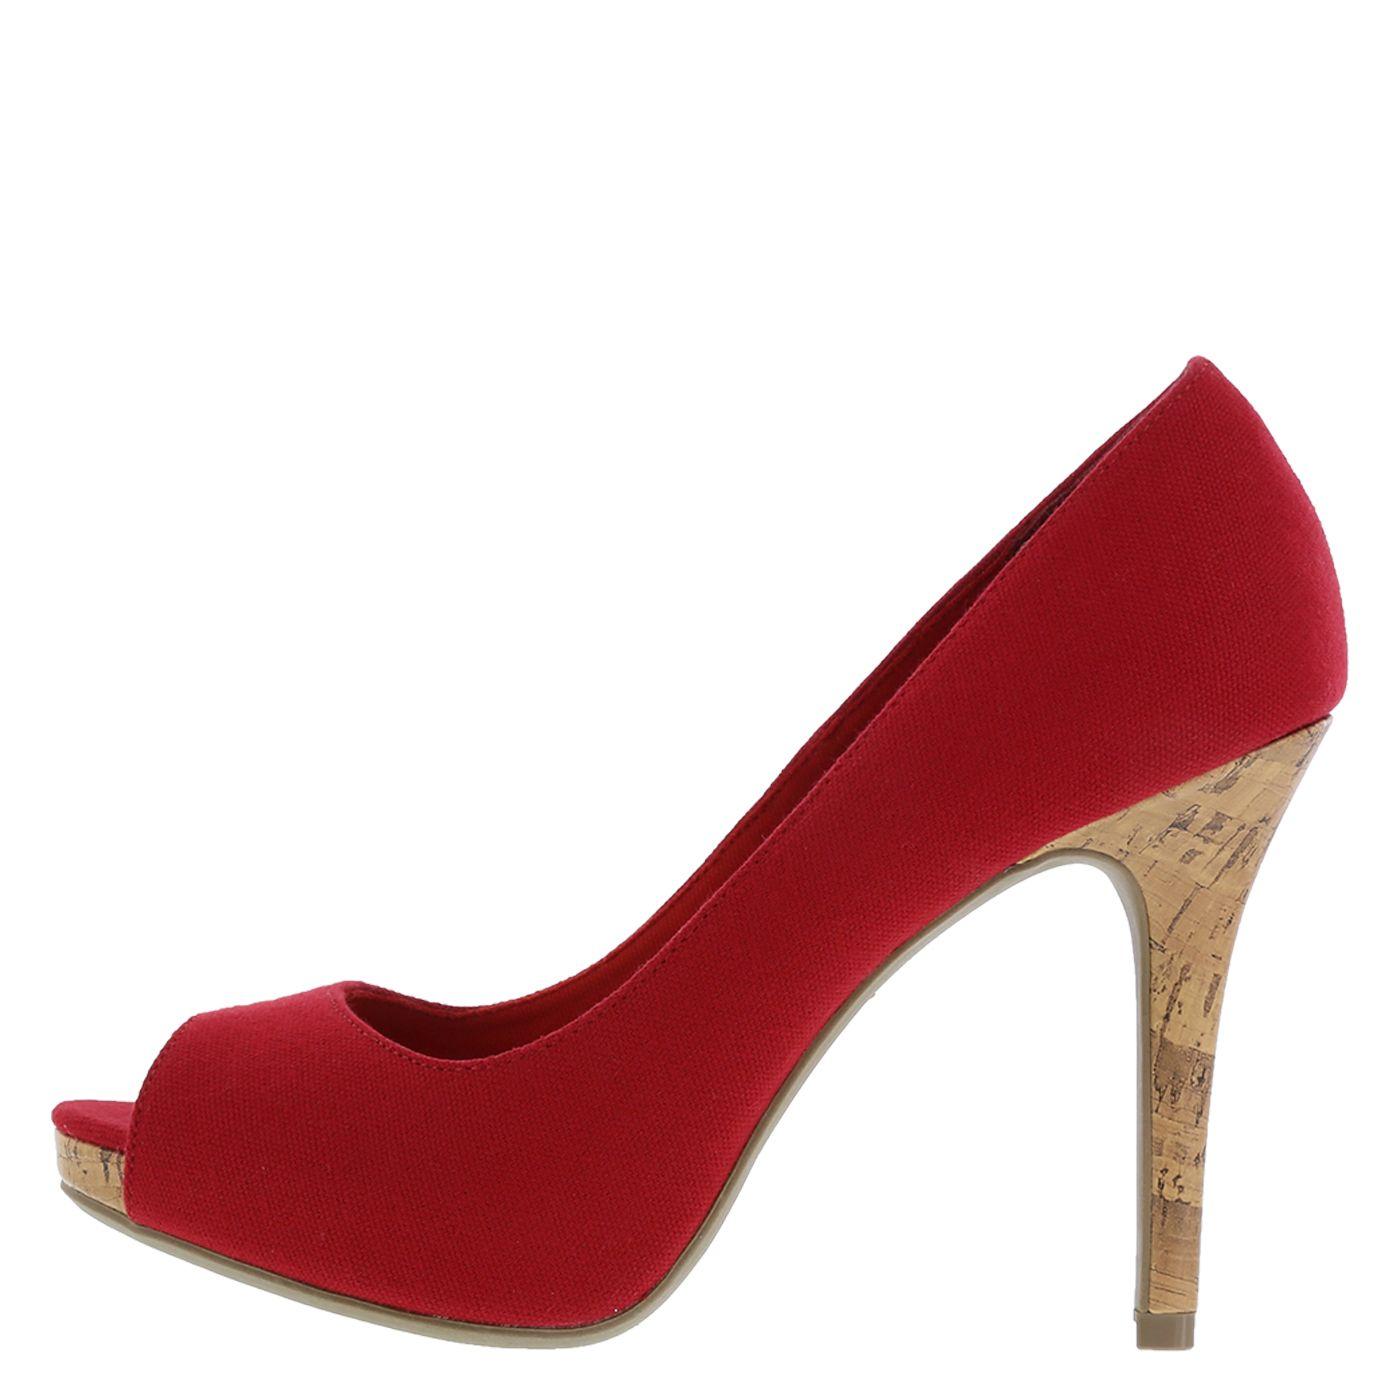 Christian Siriano Spring 2015 Women S Red Kate Platform Peep Toe Pump Payless Shoesource Platform Pumps Club Heels Peep Toe Pumps